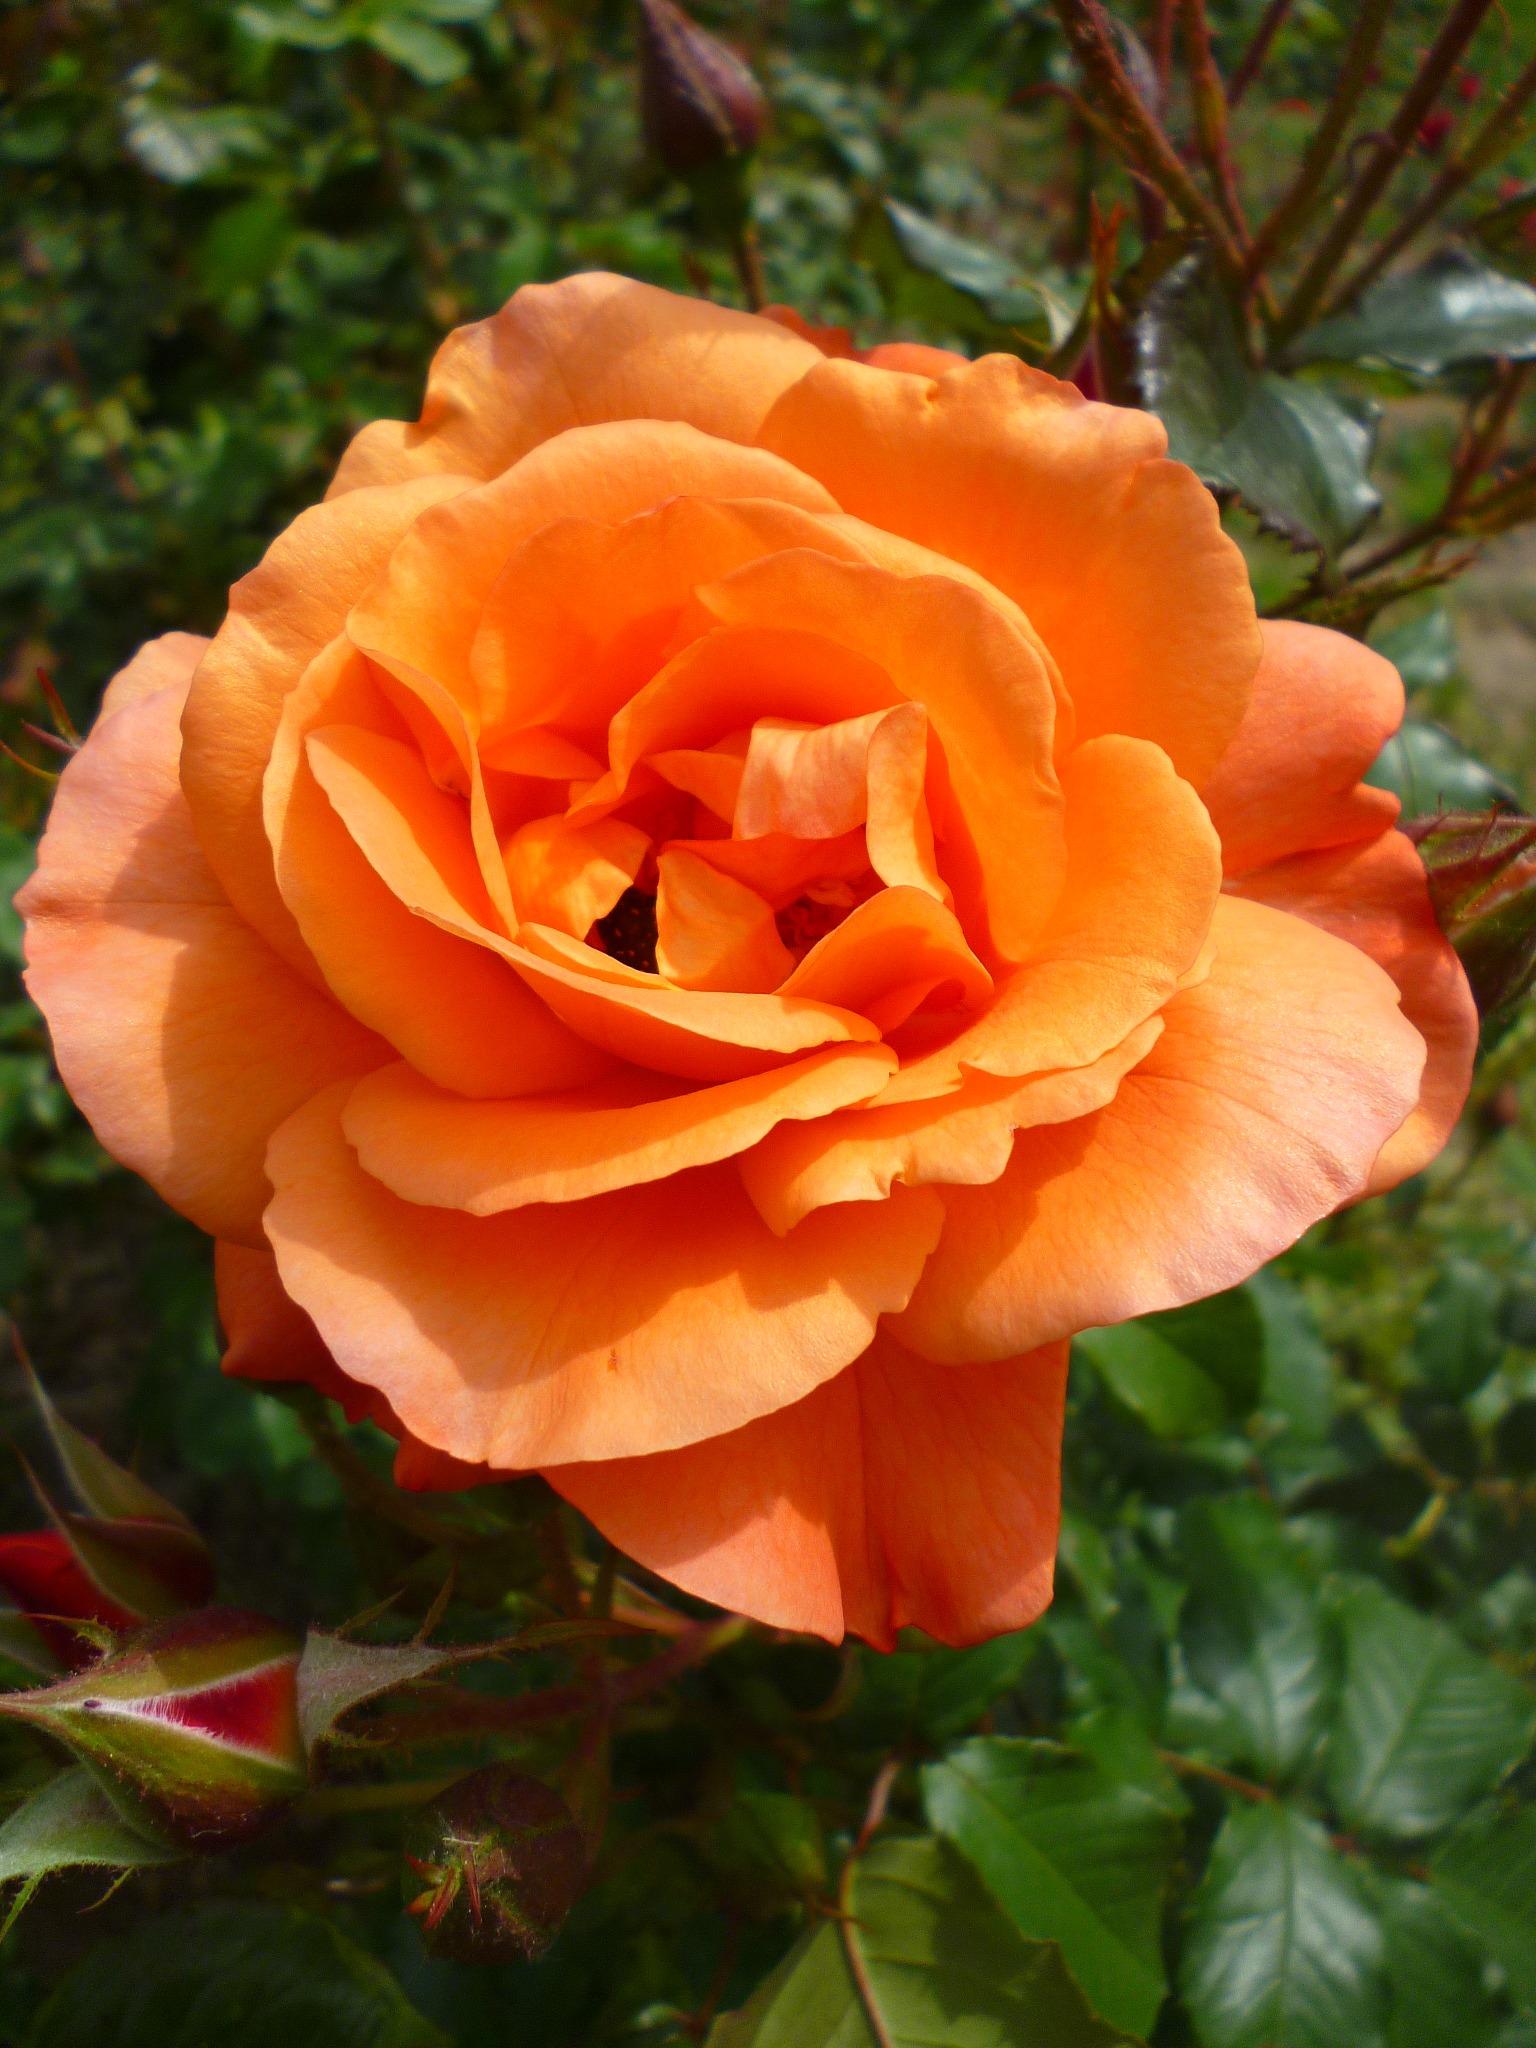 Orange Garden Rose: Summer Orange Garden Rose Free Image